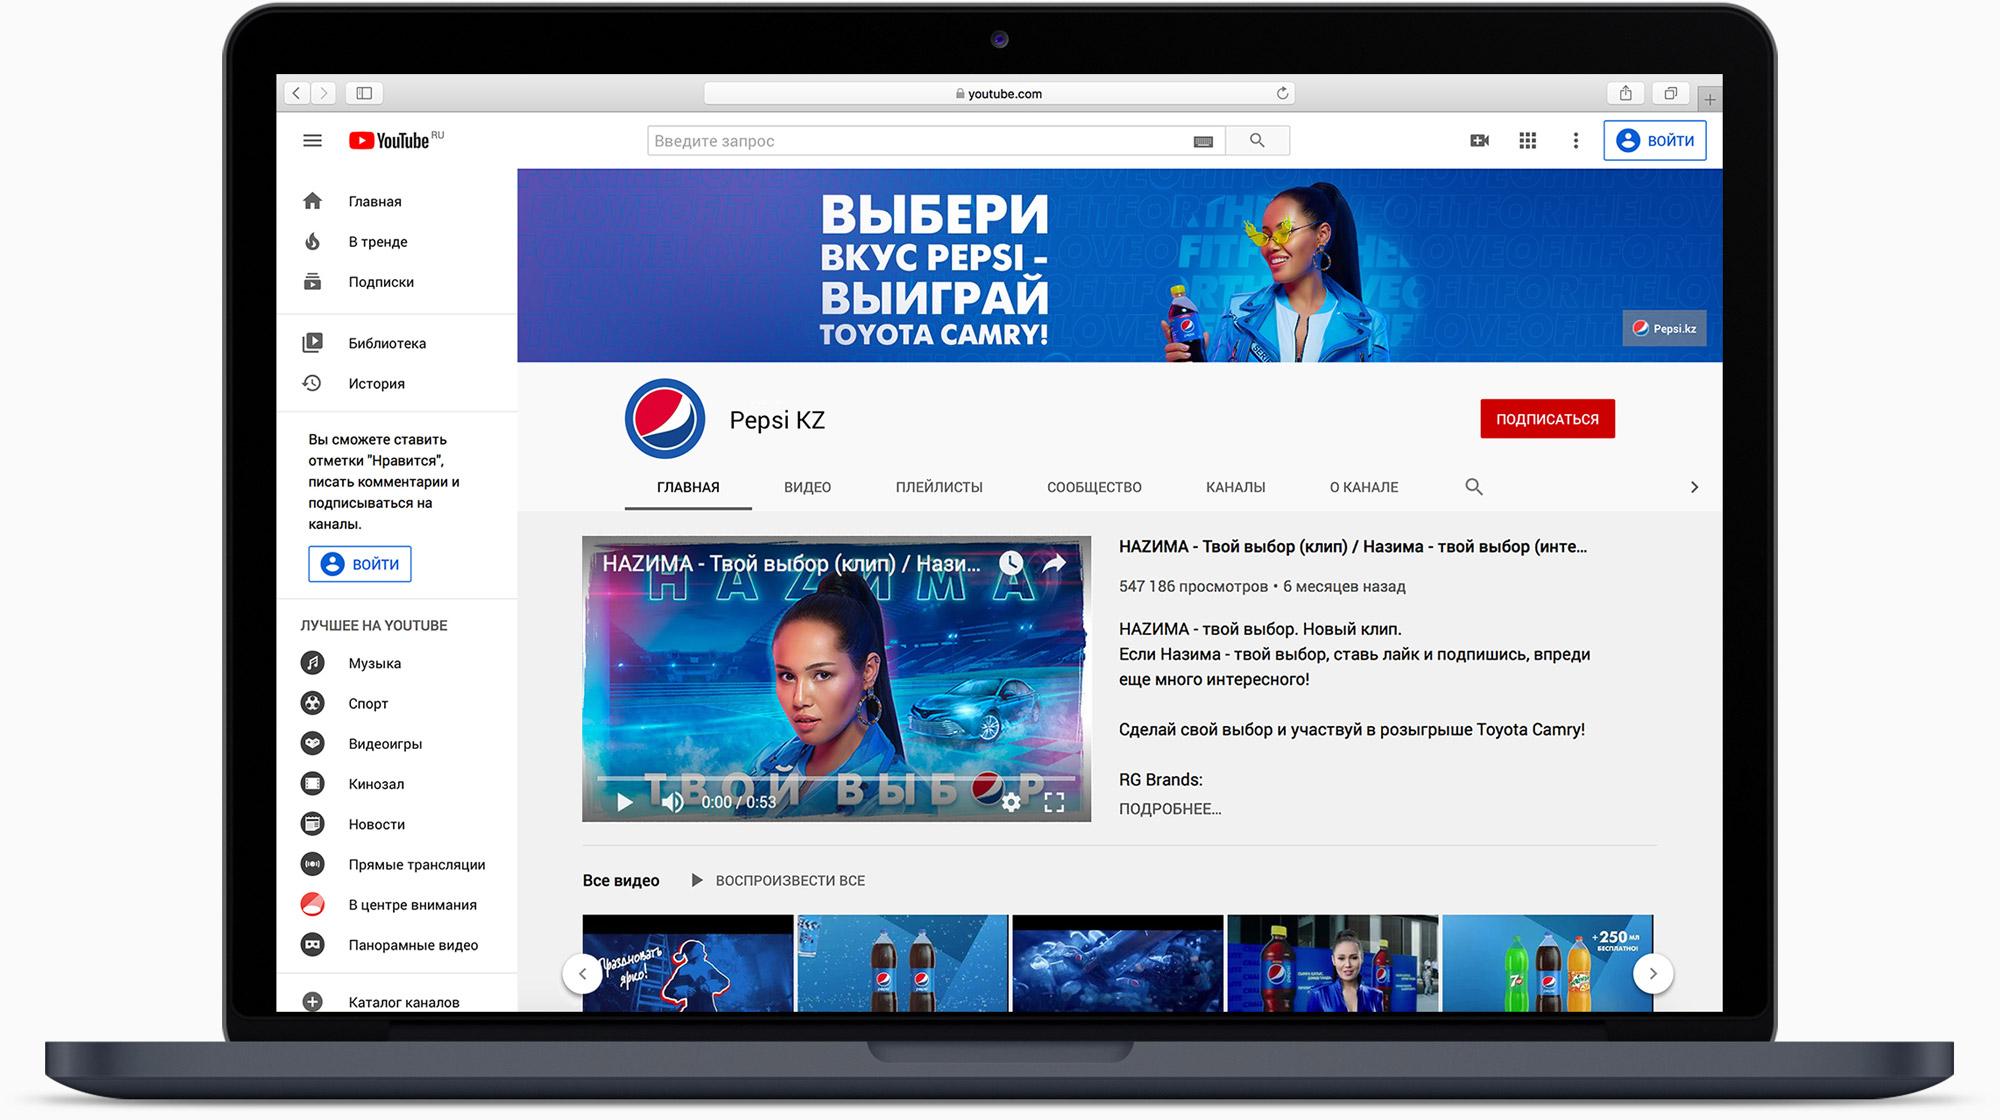 PEPSI, Digital Campaign starring НАZИМА (Black Star). Photographer: Alexander Sakulin